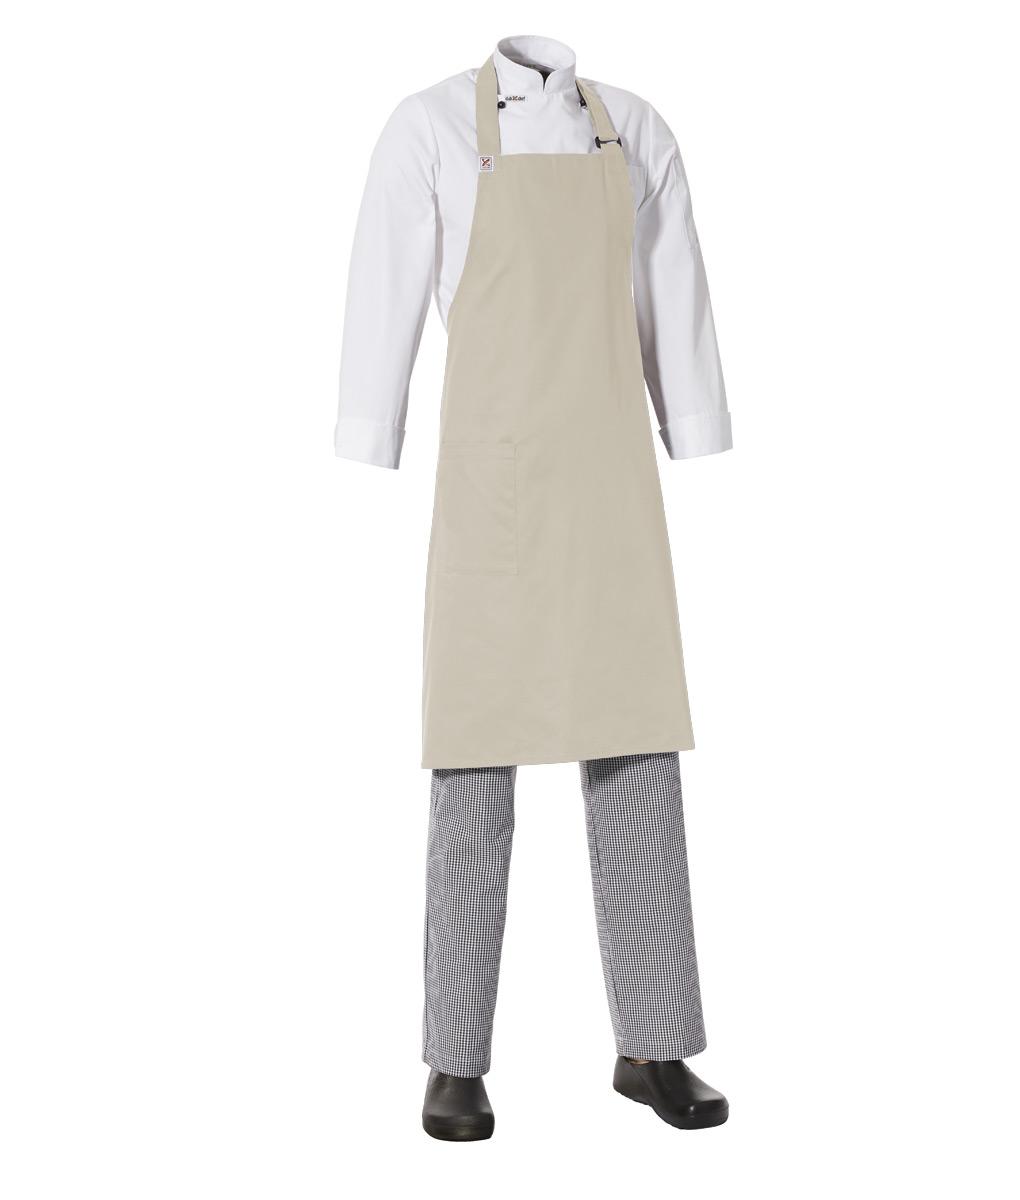 Bib Apron with Side Pocket by Club Chef Aprons 3